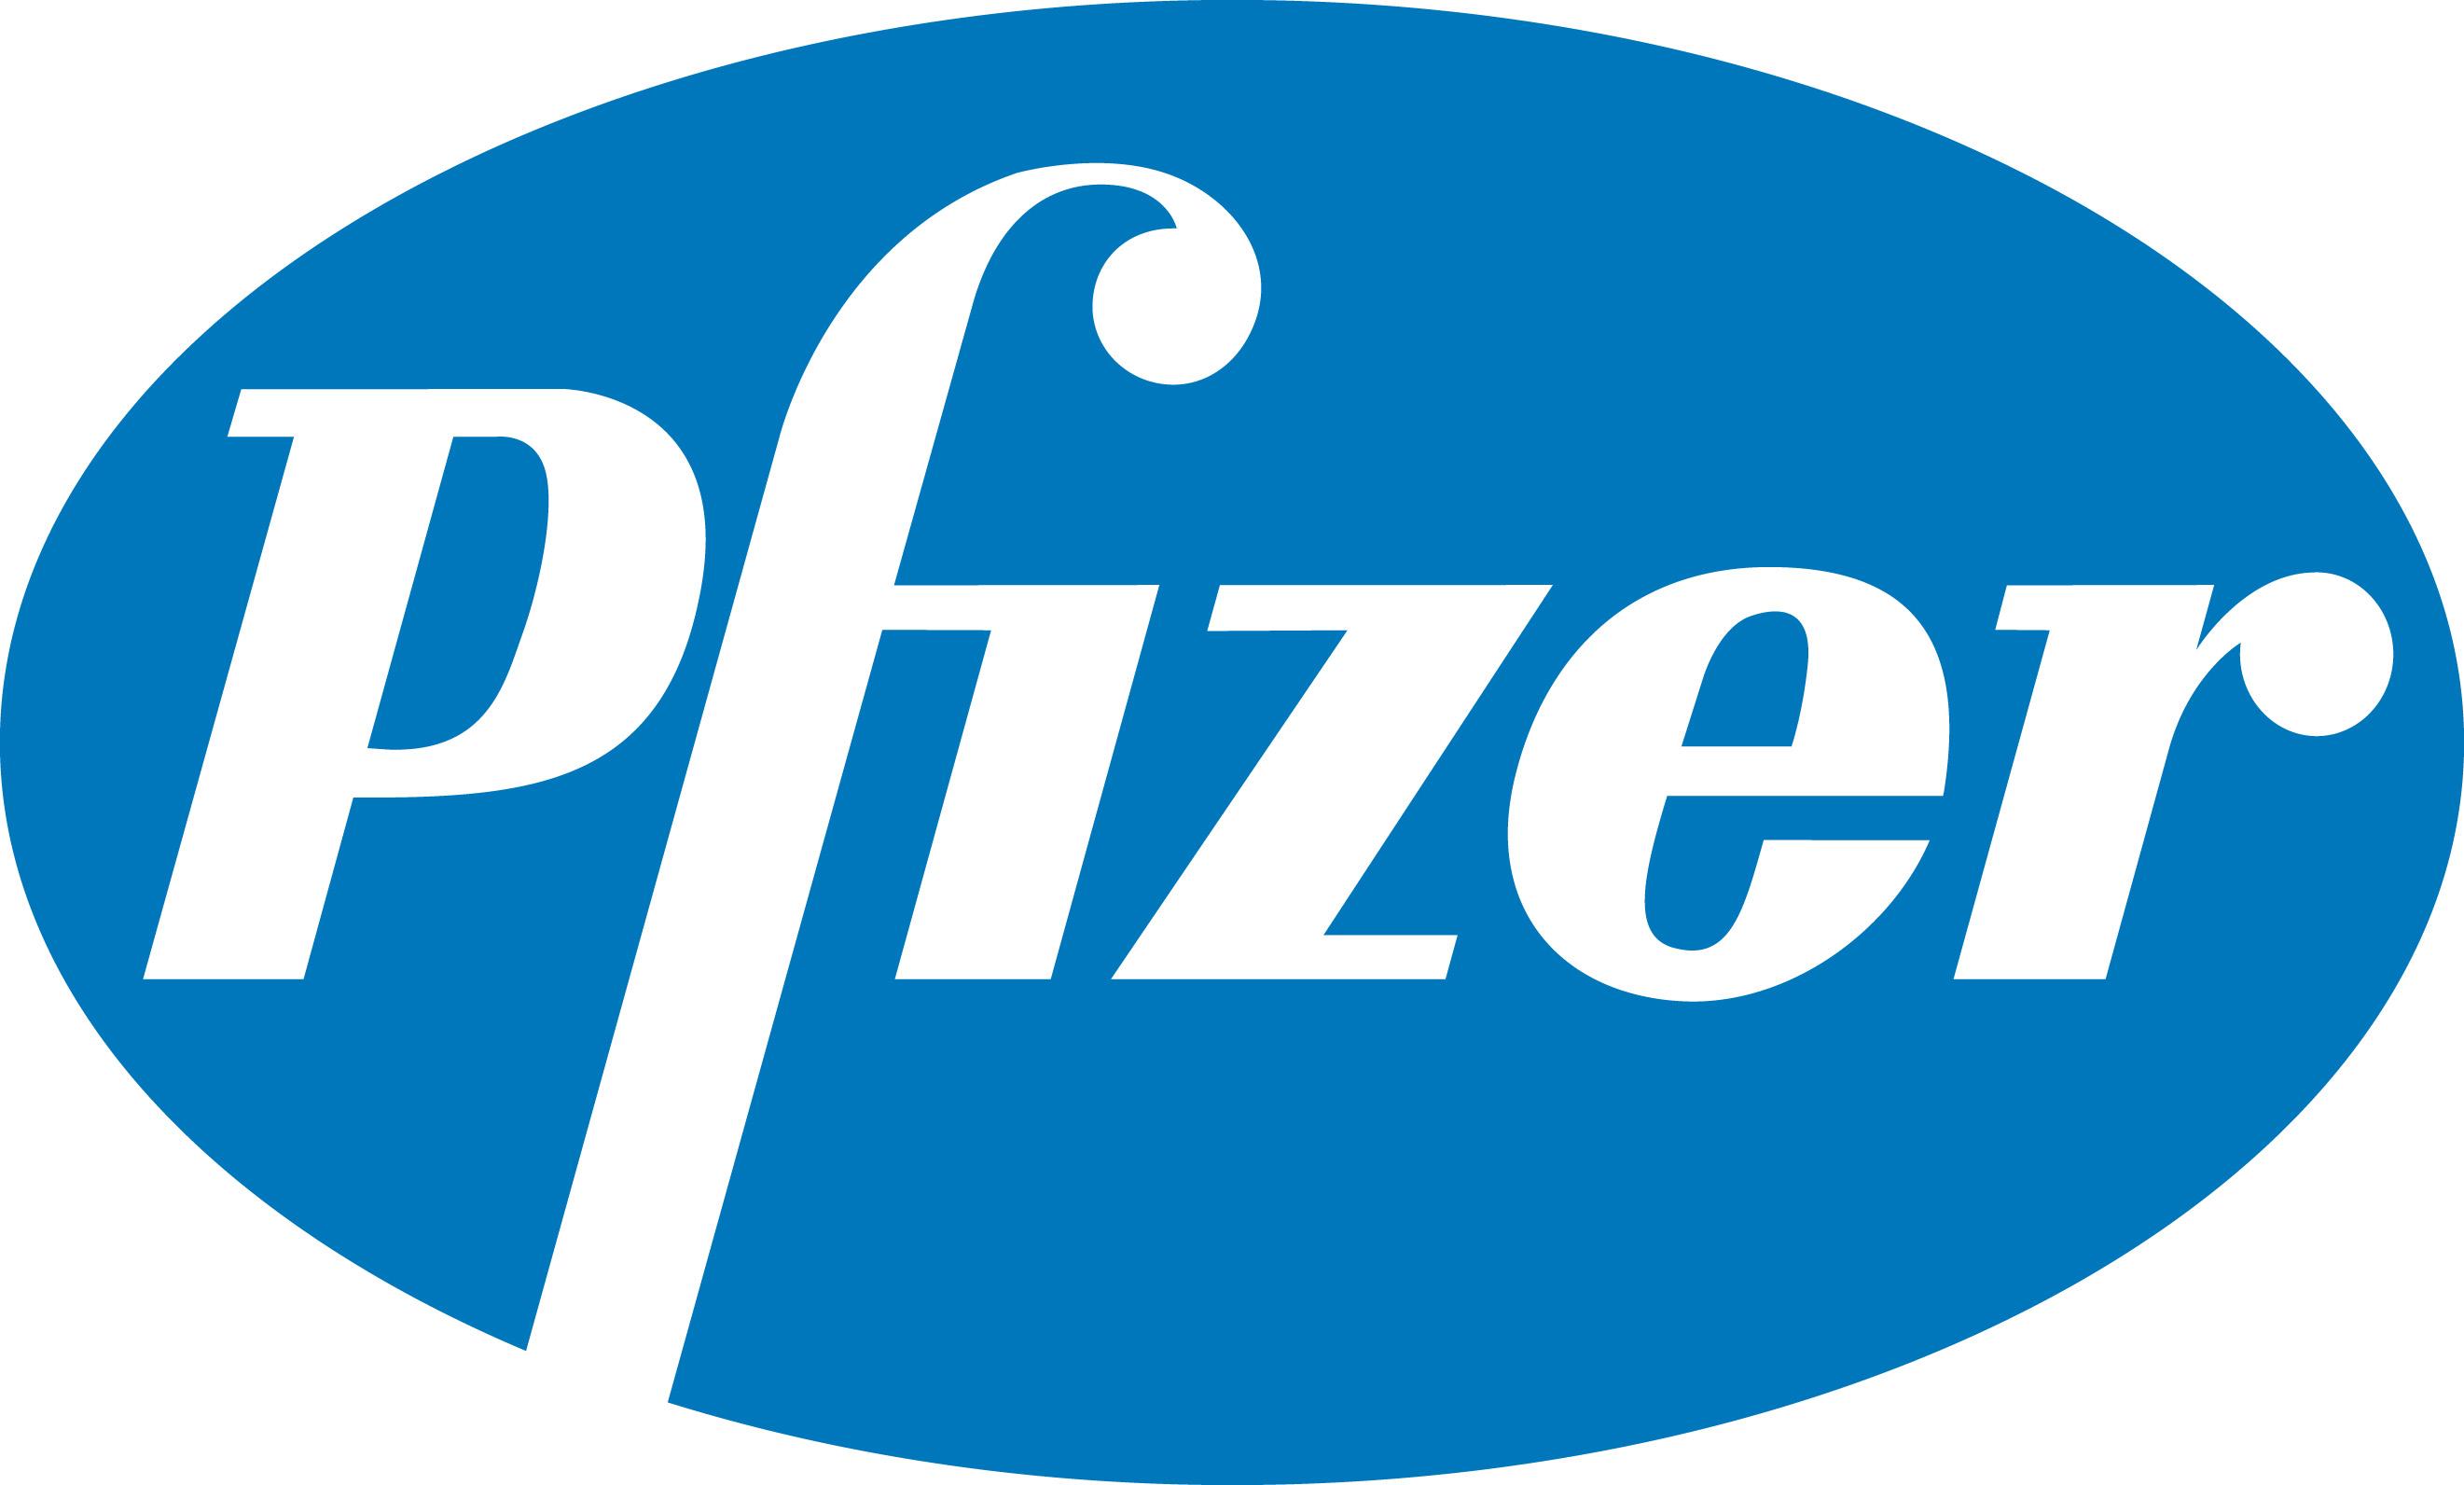 Pfizer Pension Trust profile image